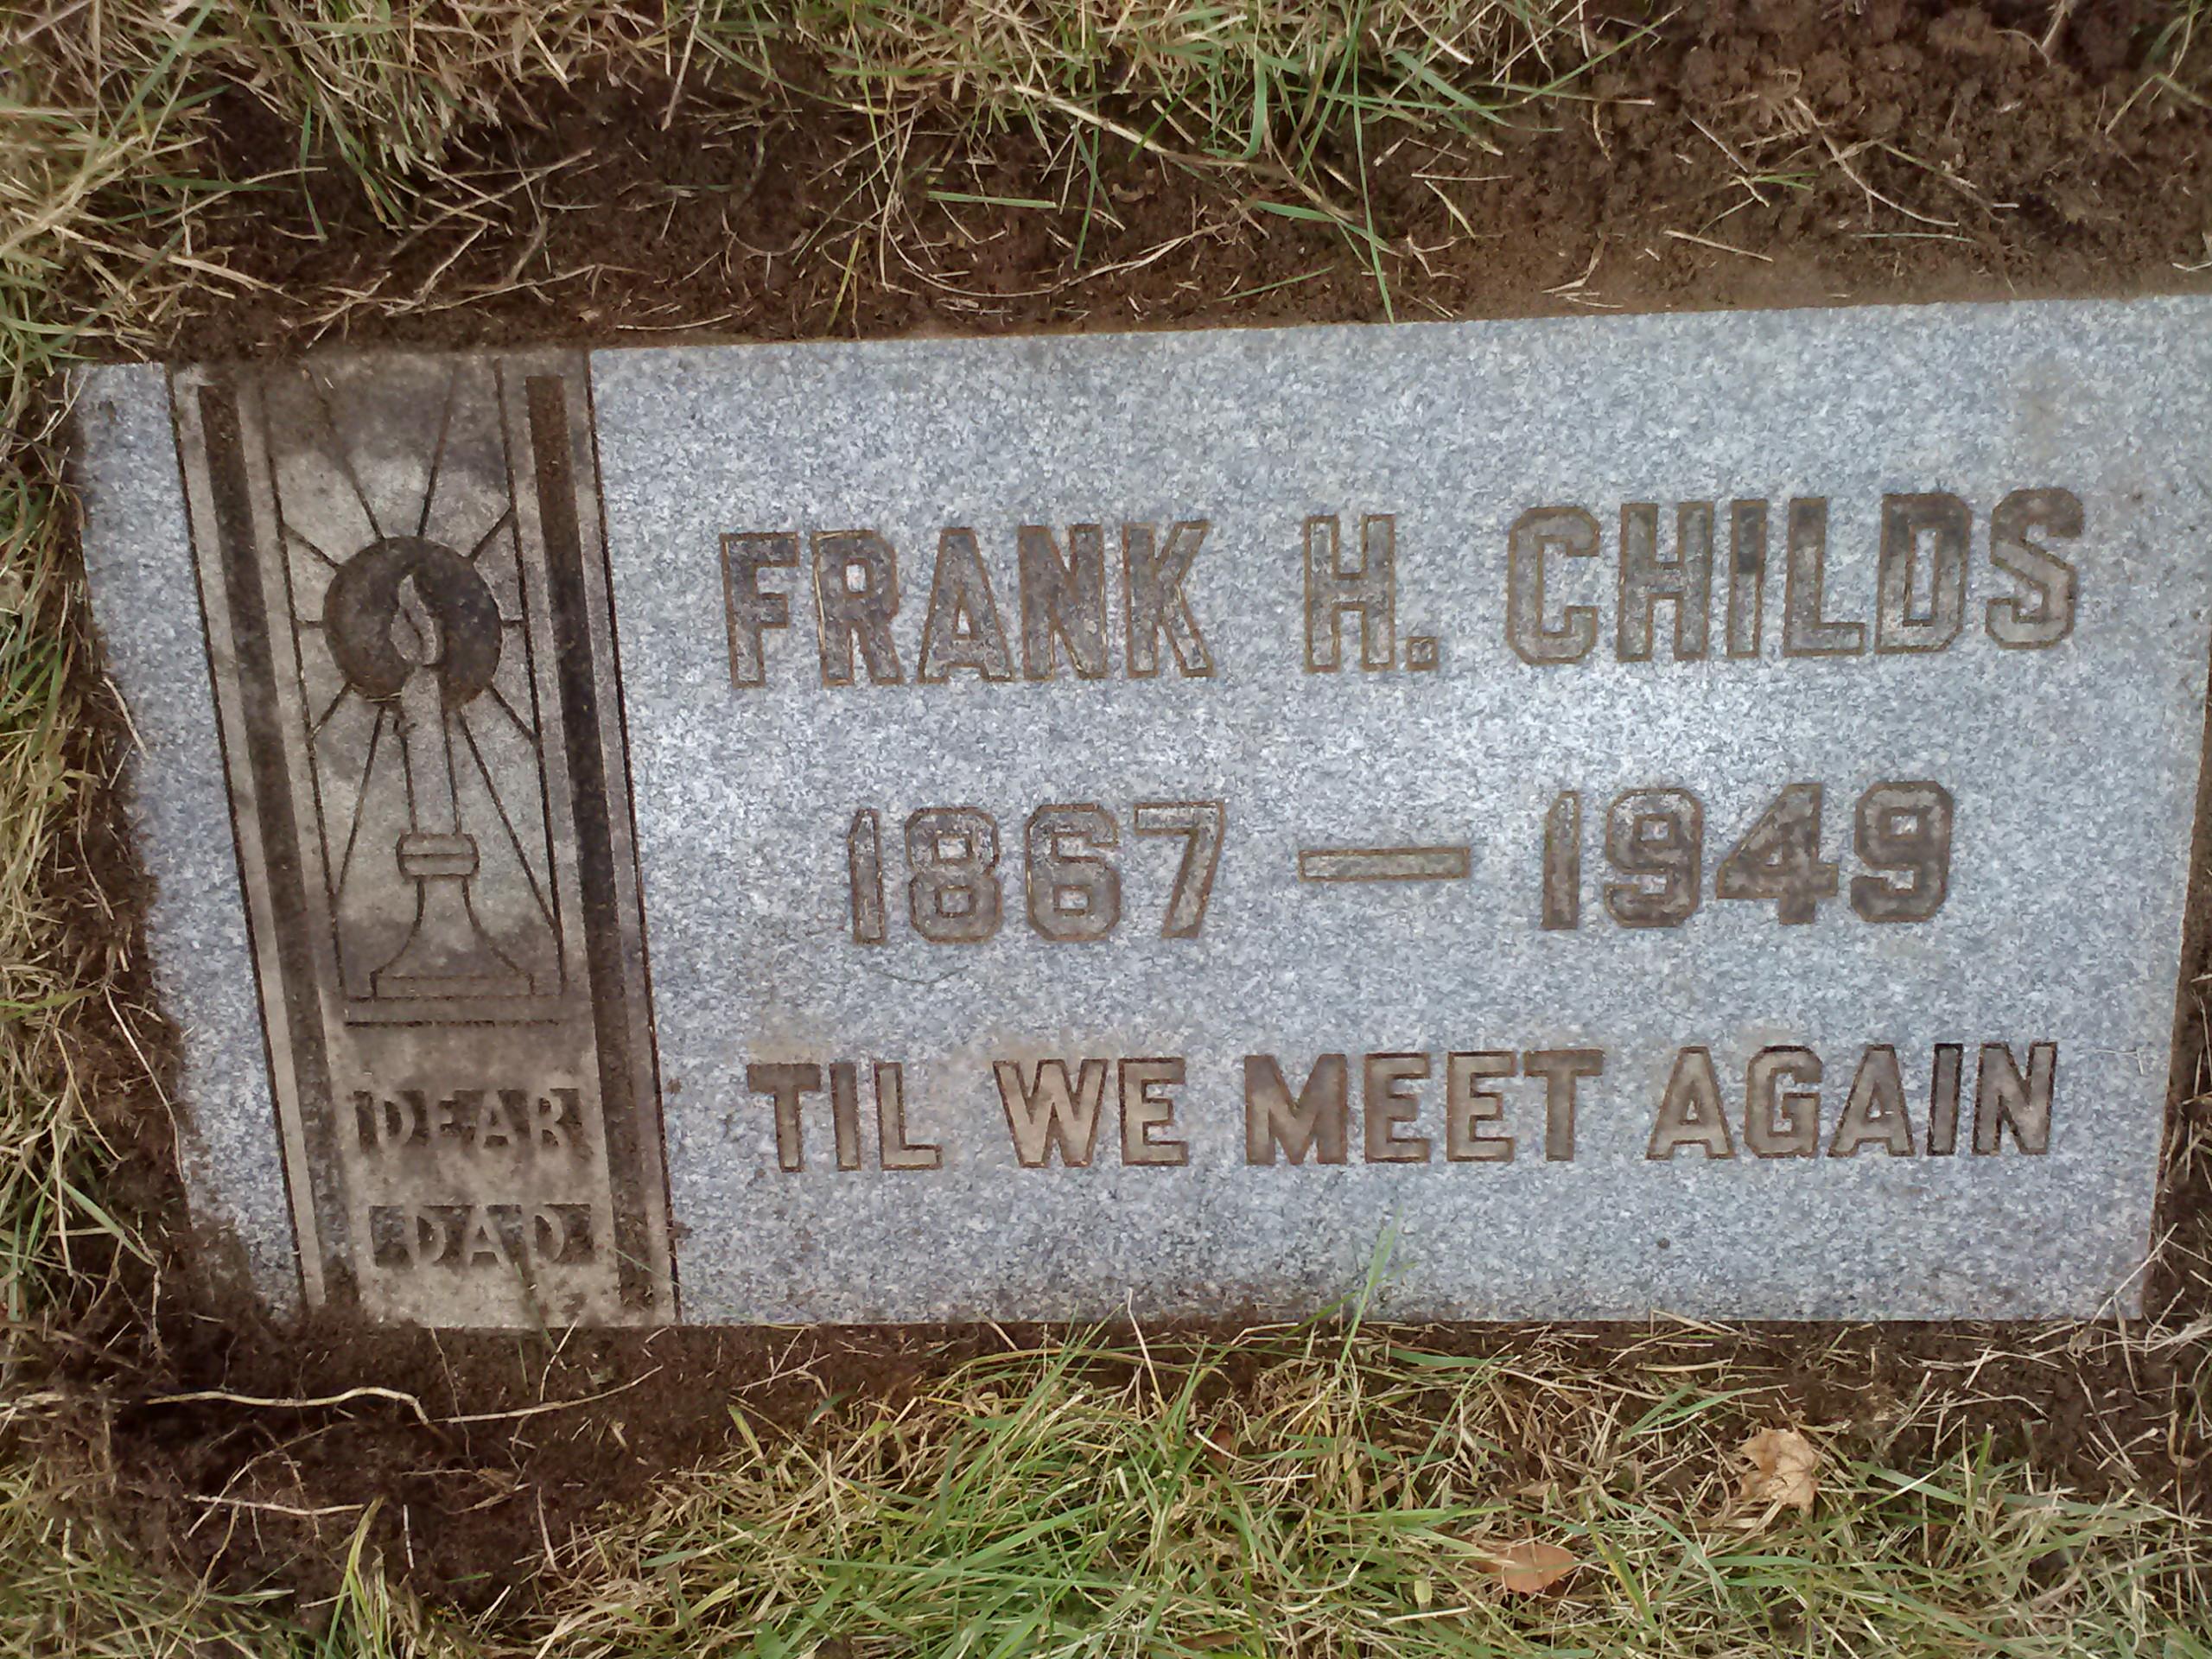 Frank H Childs